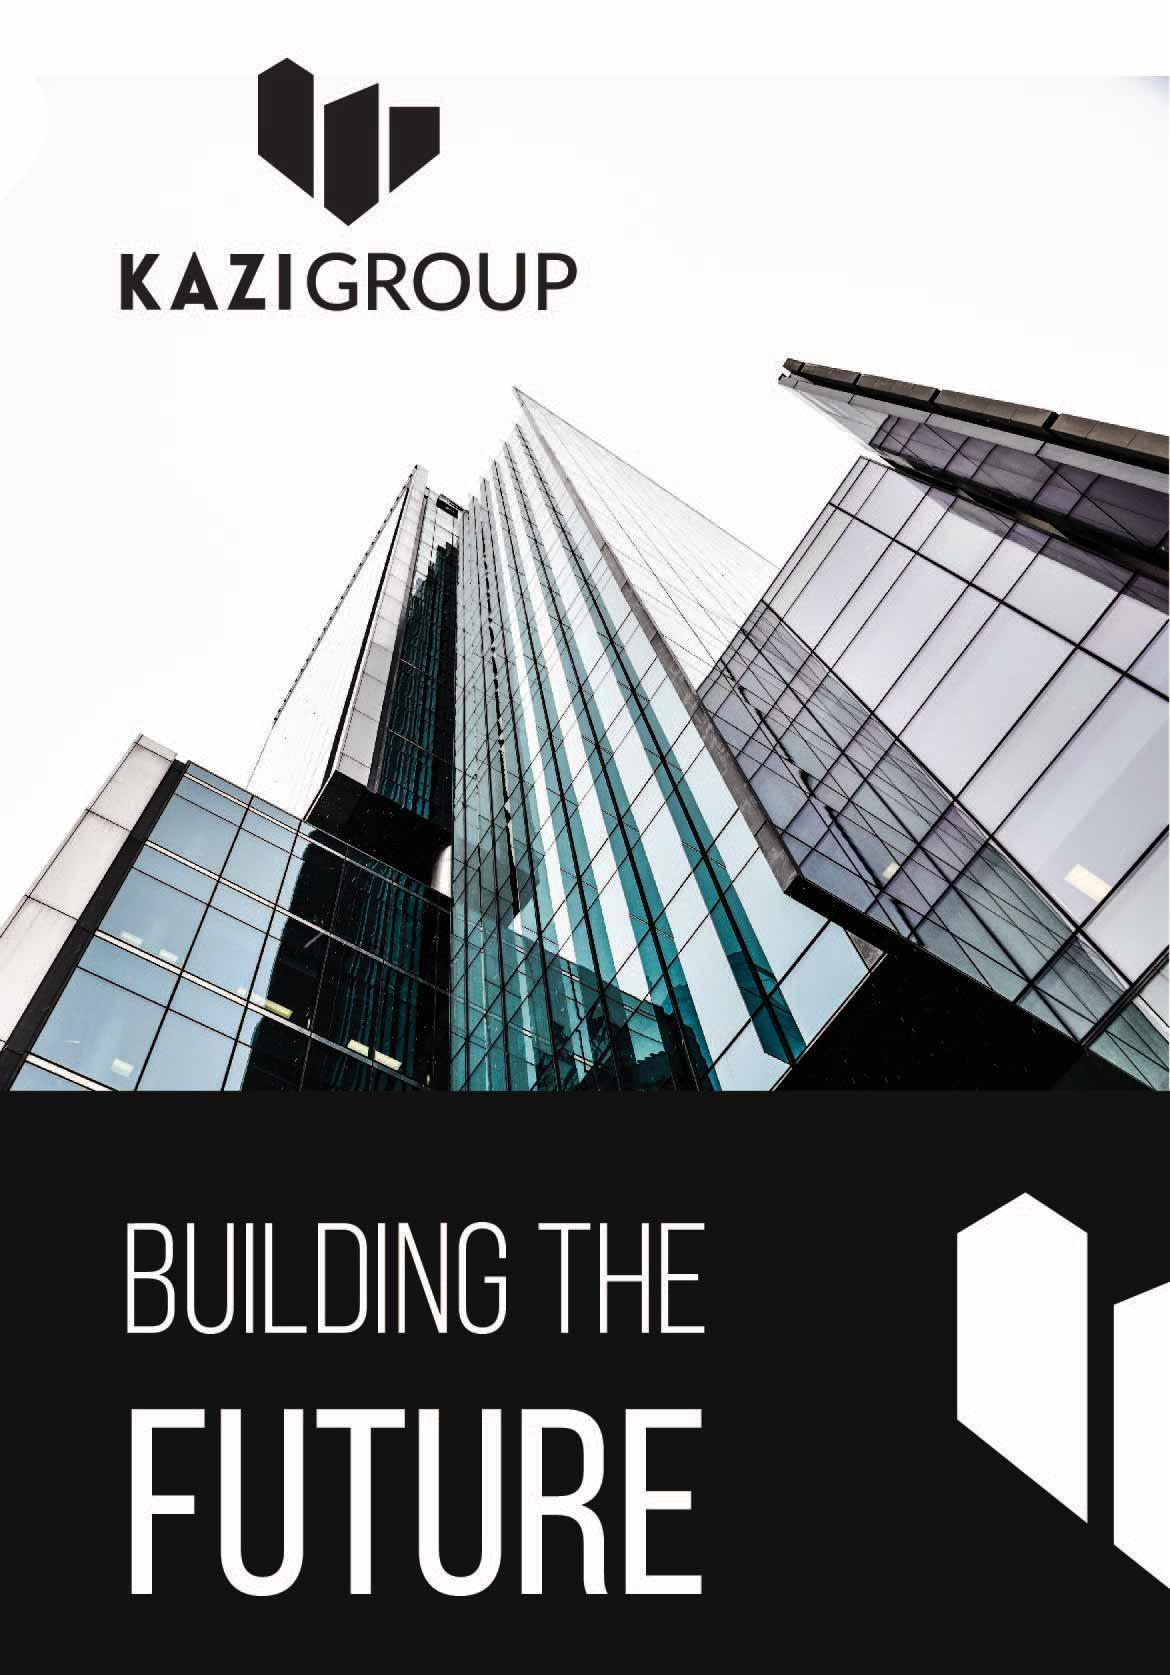 Kazi Group flier